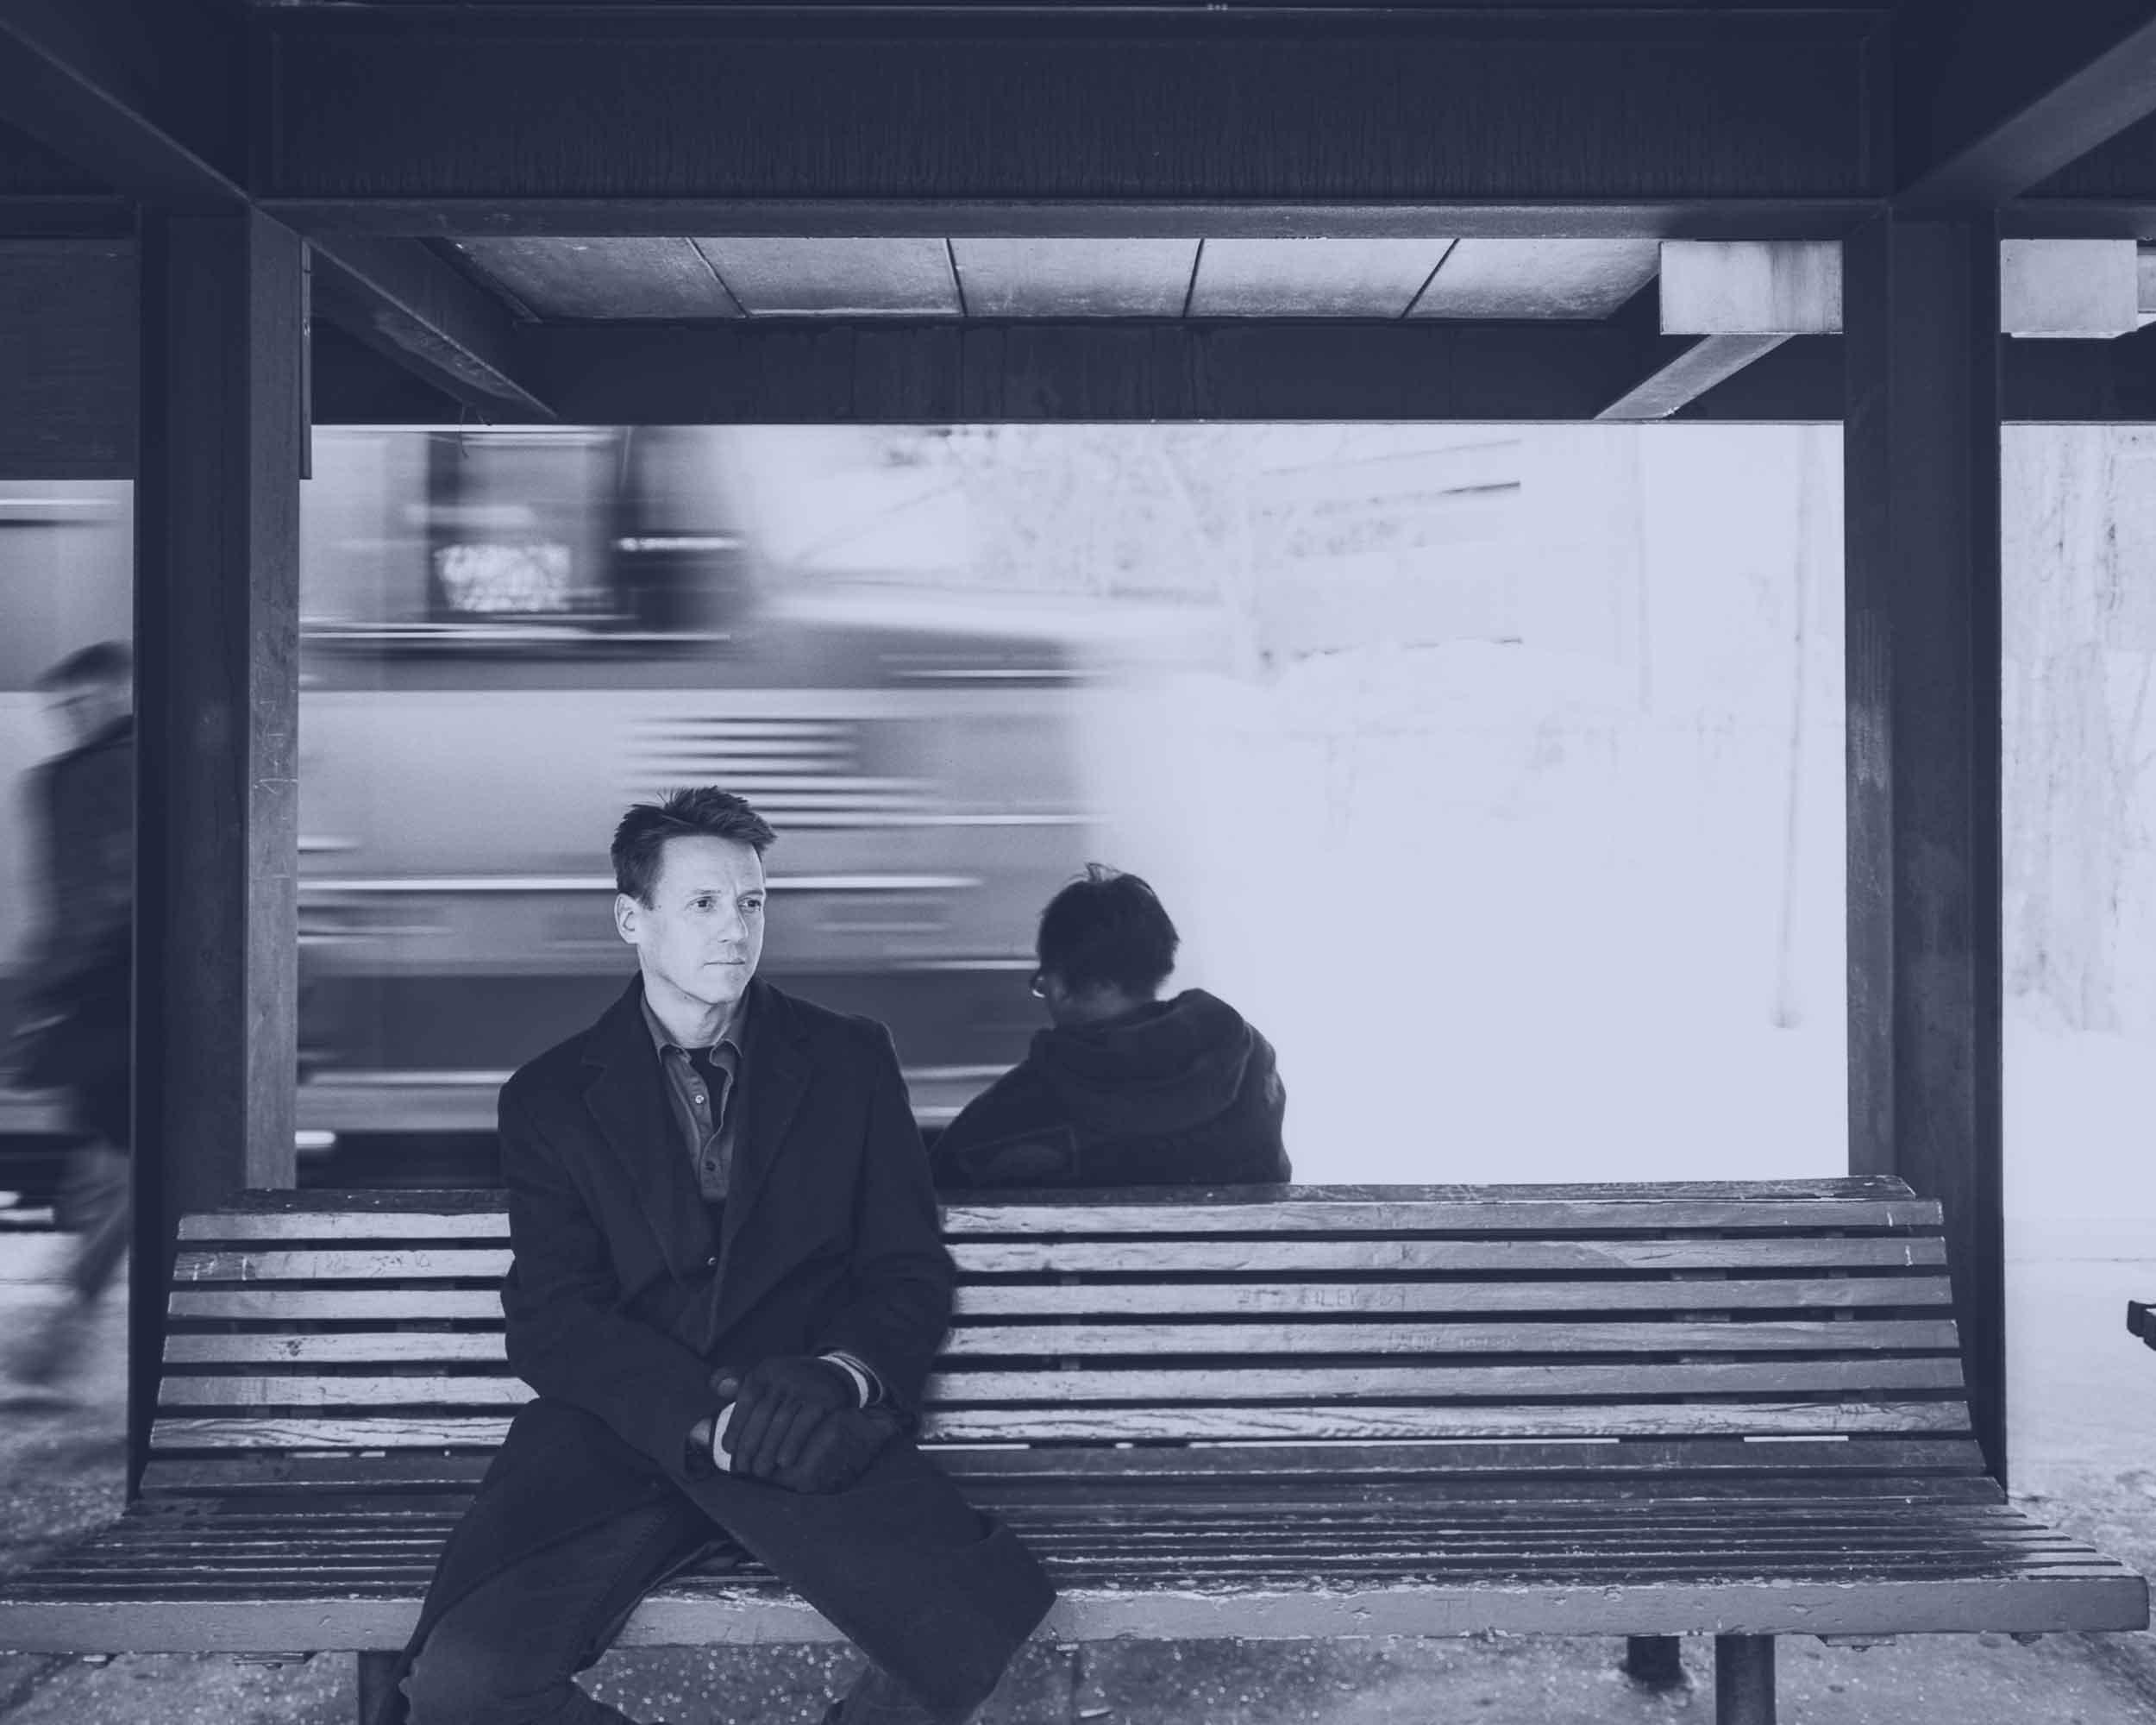 alan-station-bench